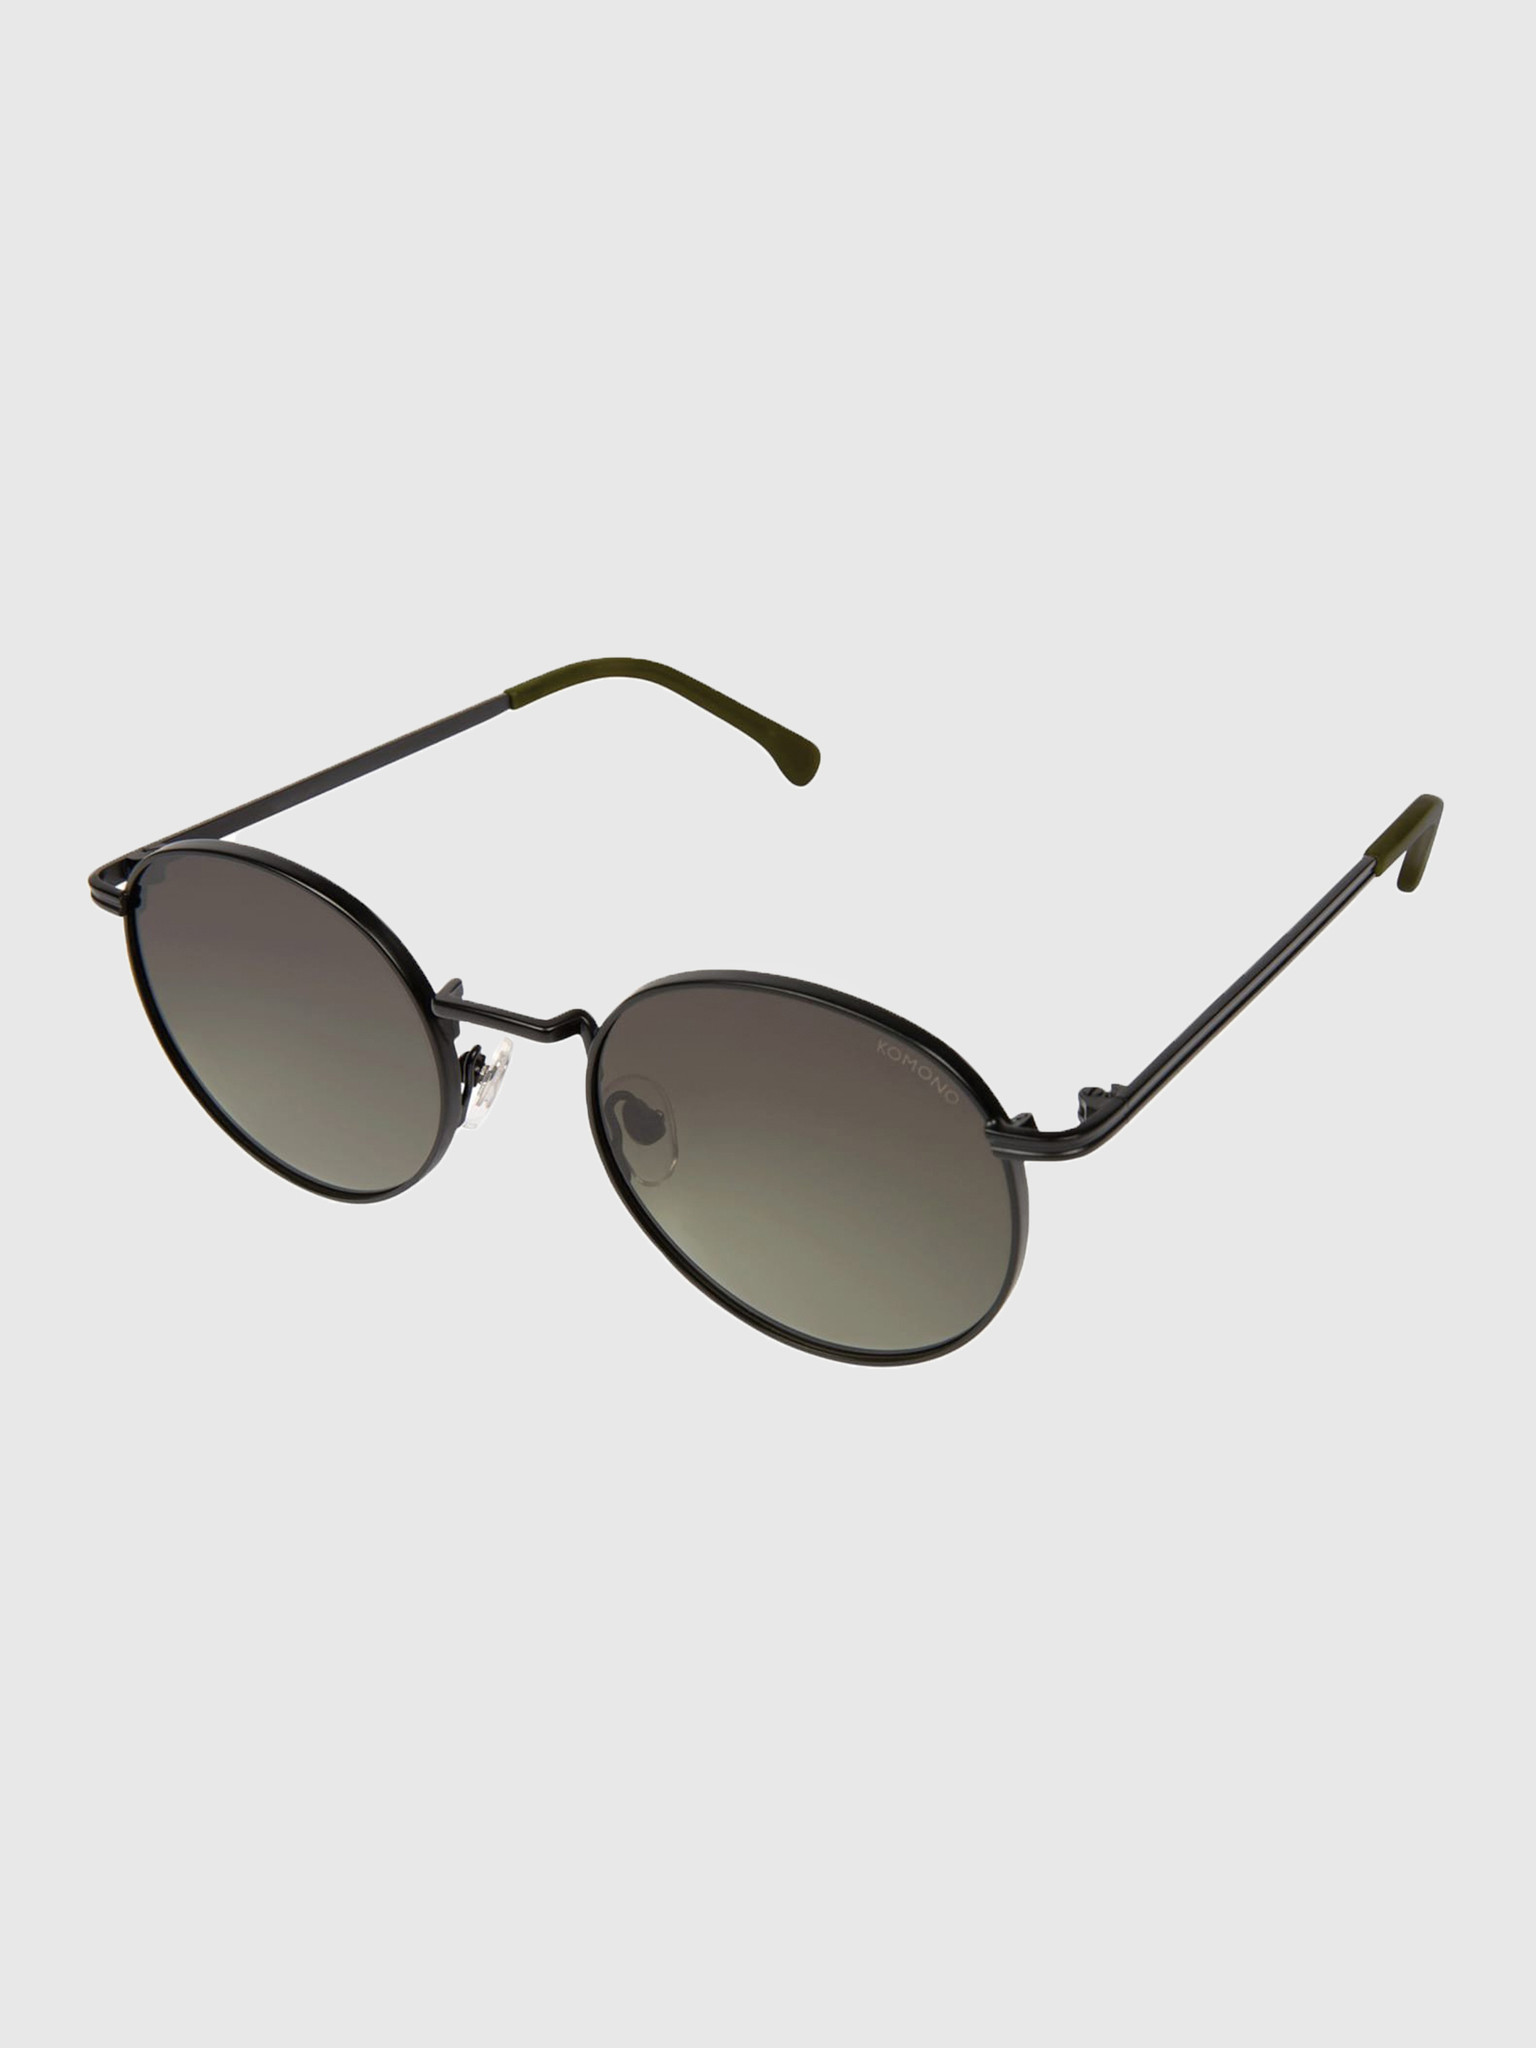 Komono Komono Taylor Sunglasses Black Green Kom-S2452